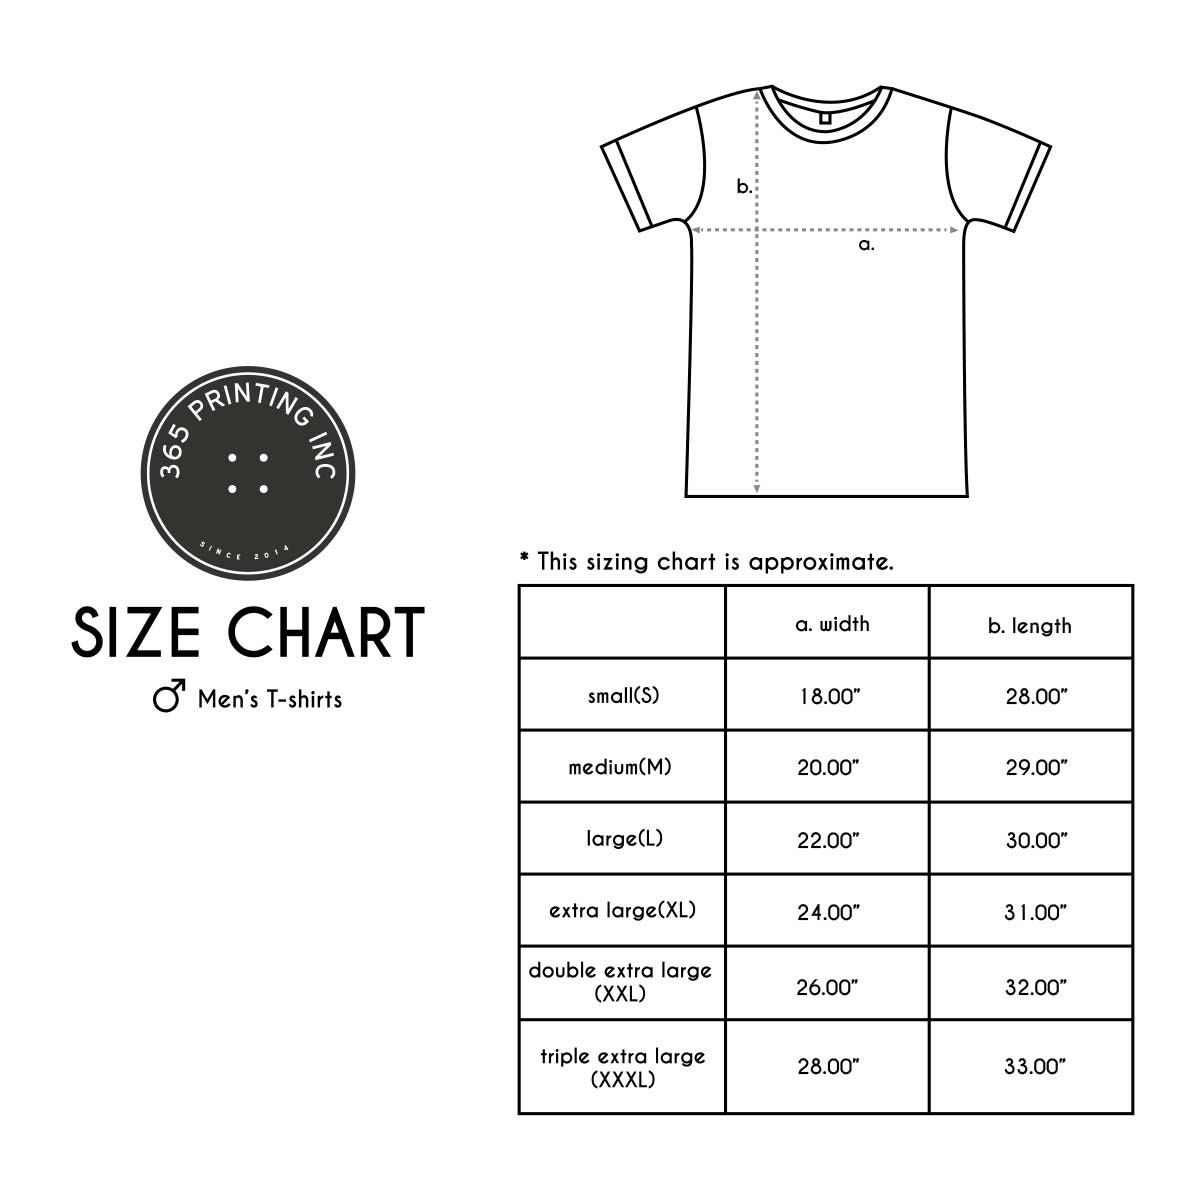 2aaf73ed7 Men's Funny Graphic Tees - Free Hugs Black Cotton T-shirt @Crowdz